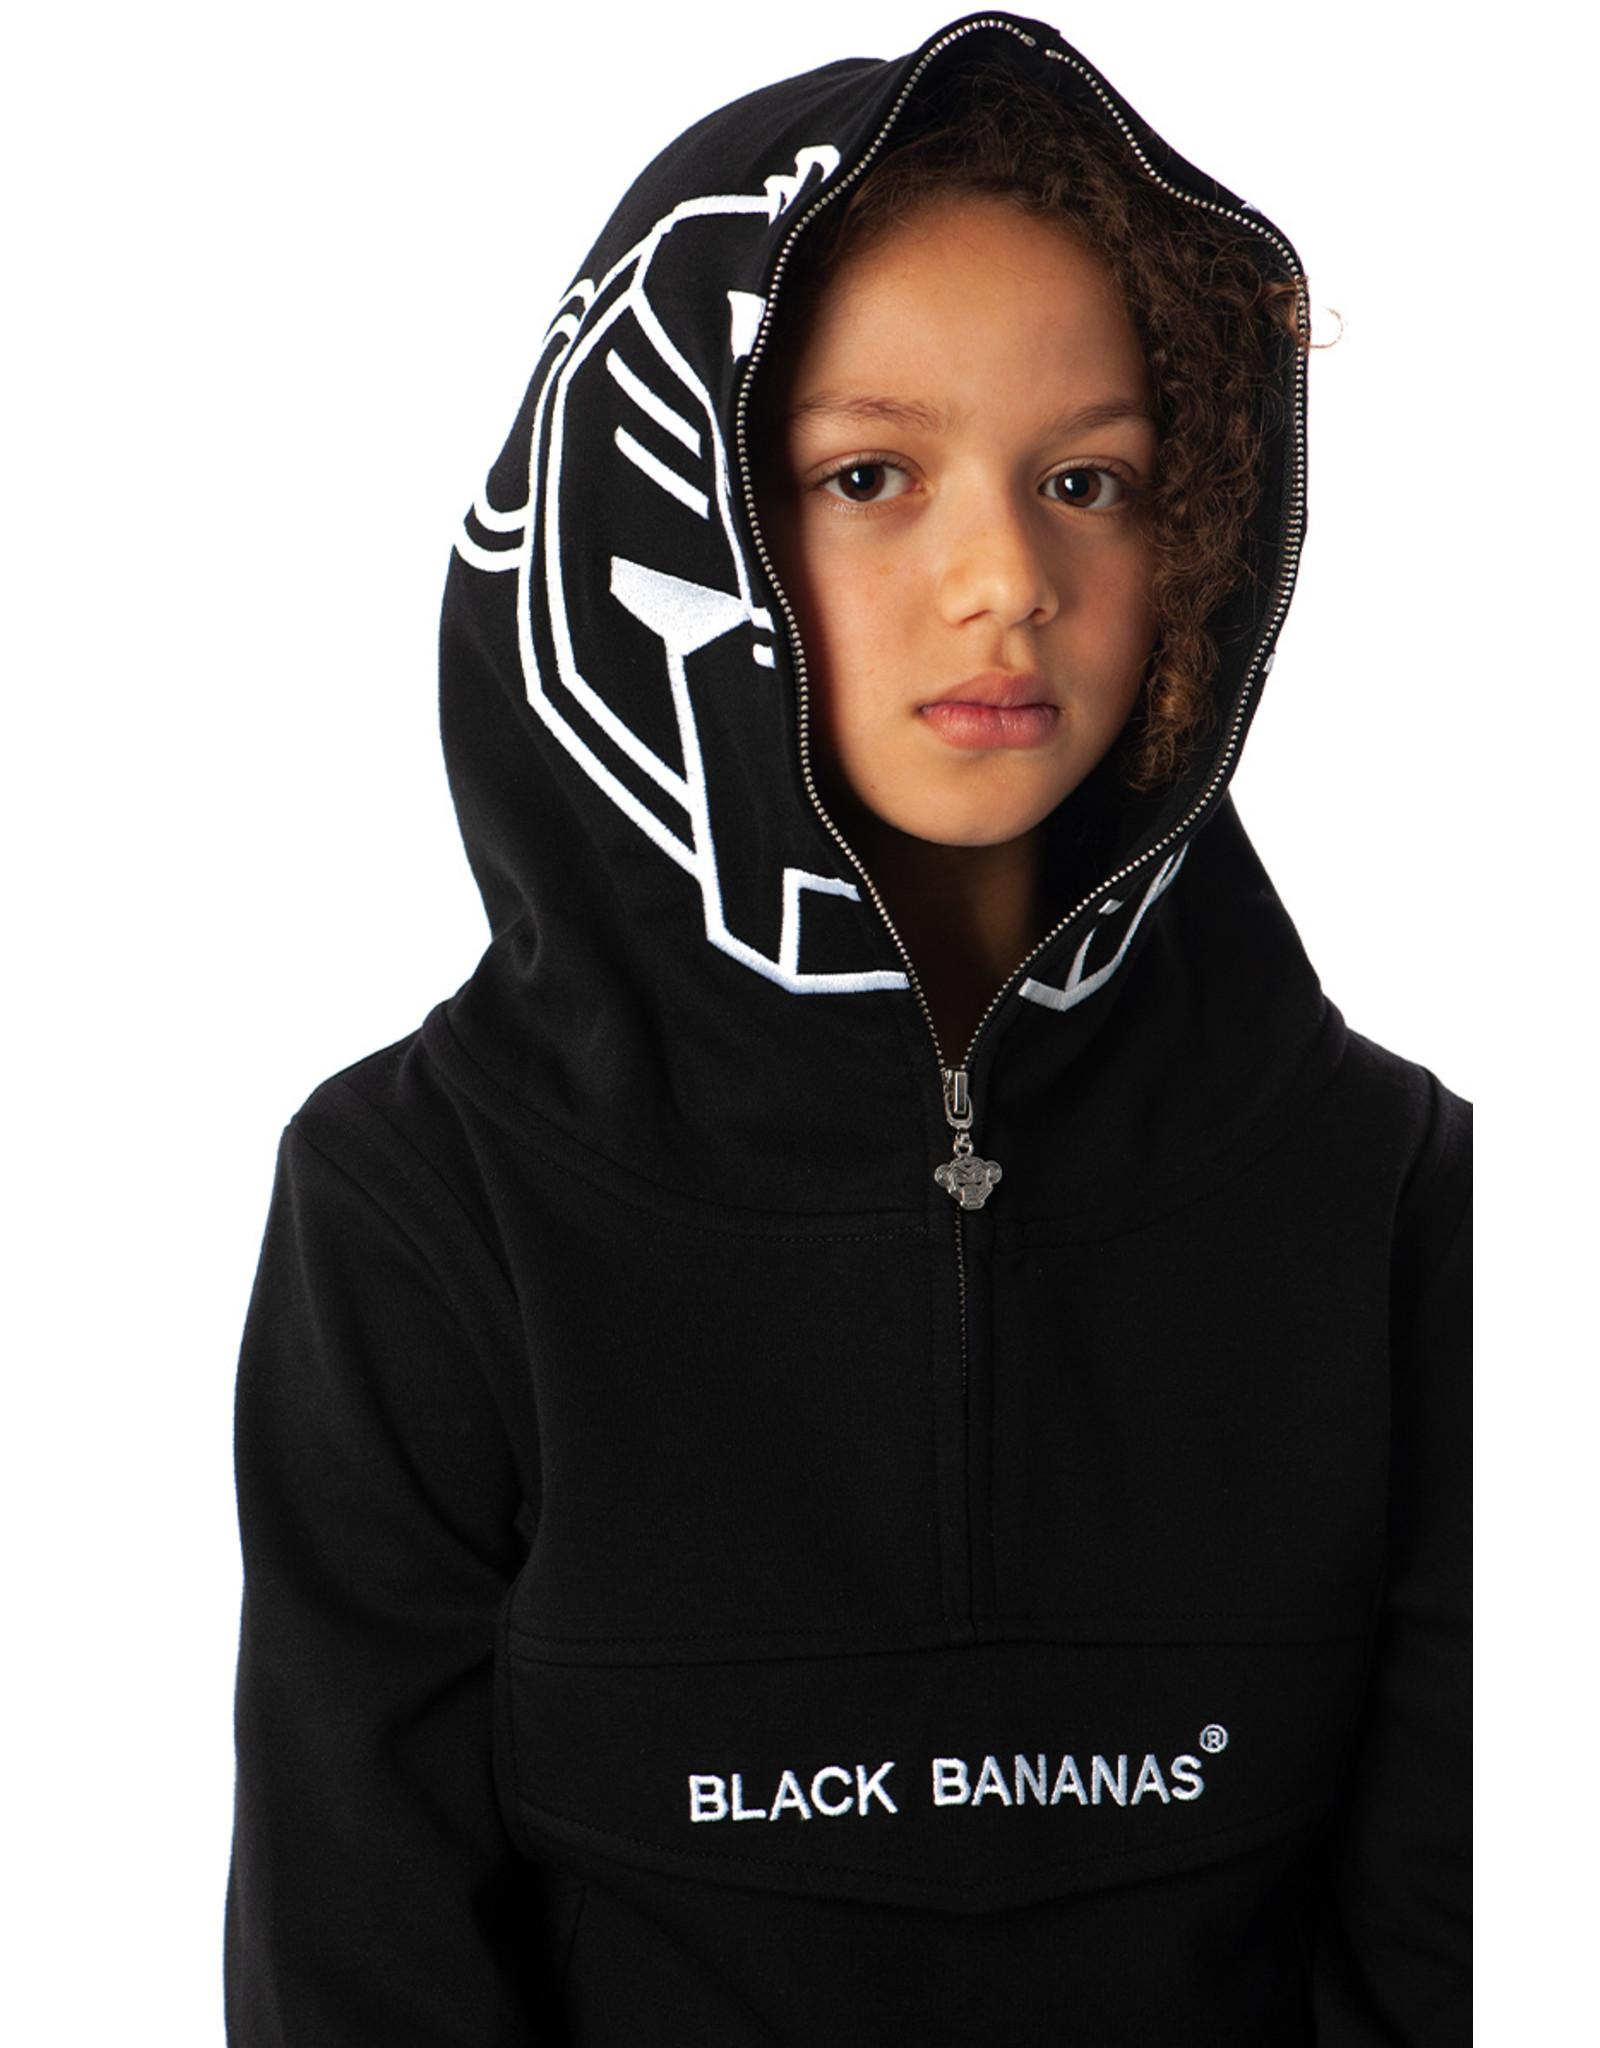 Black Bananas JR Incognito Hoody Black